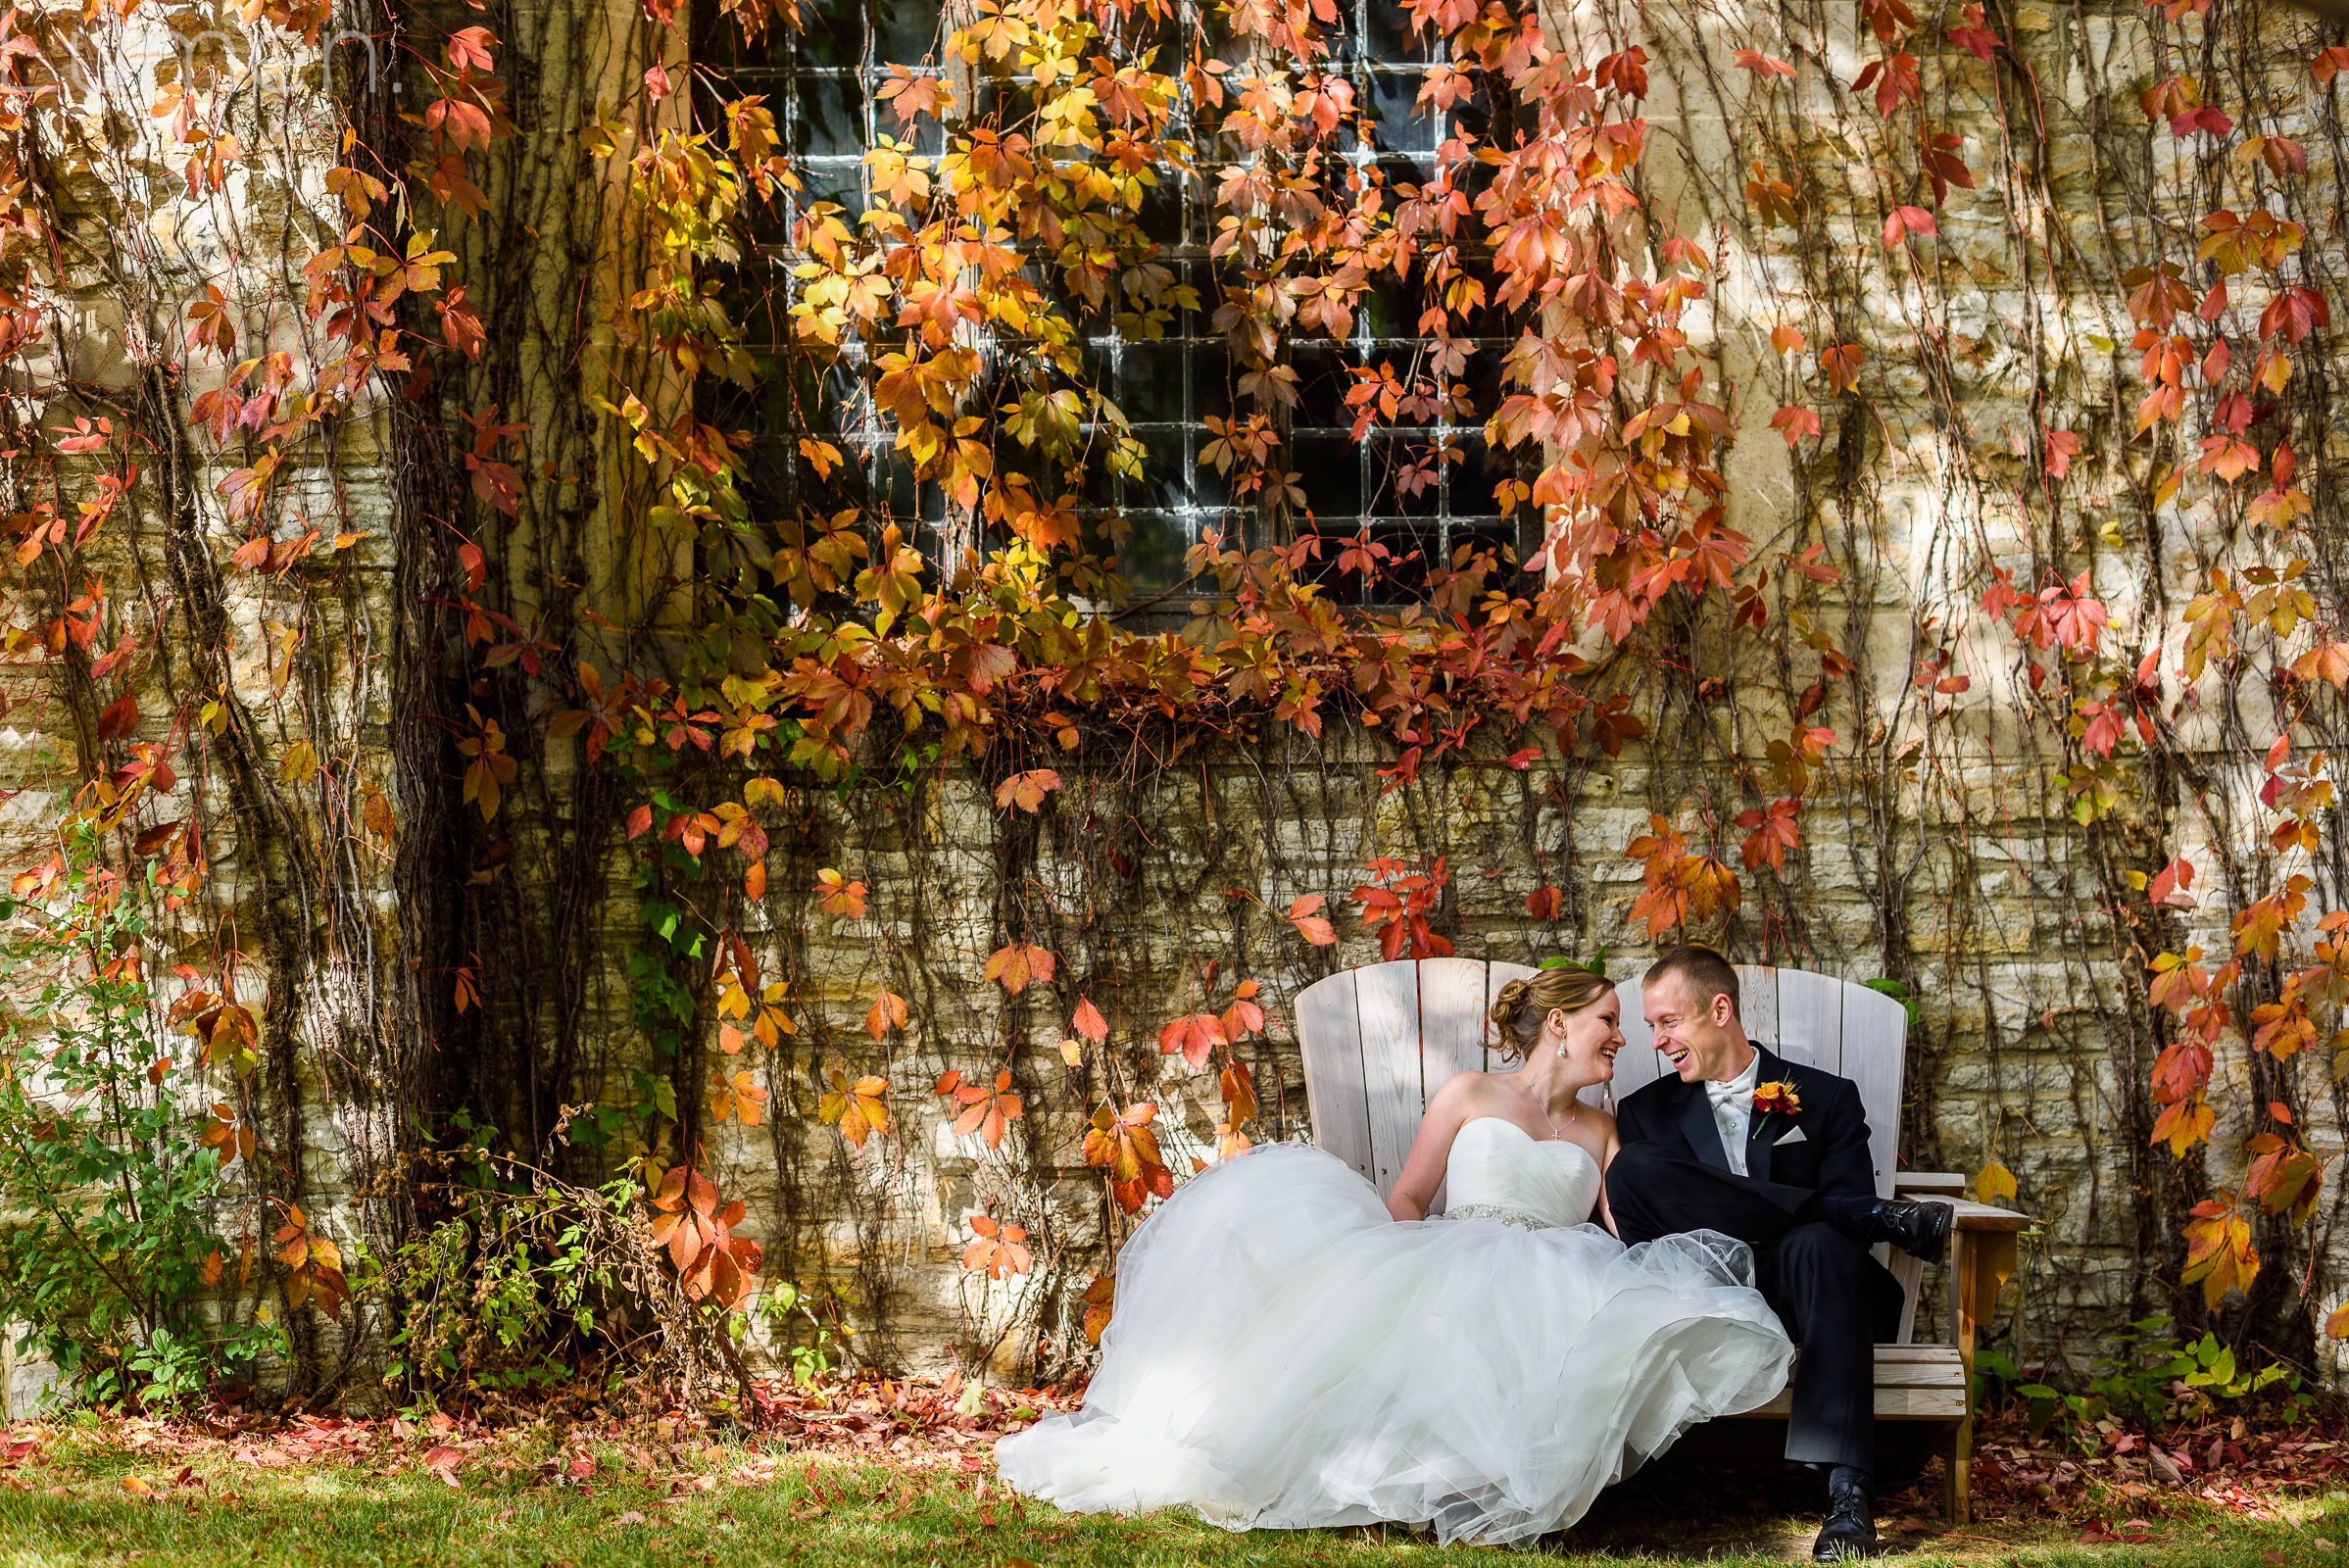 Boe Chapel Wedding Photos: Erin and Matt Part II - Lumen Photography.